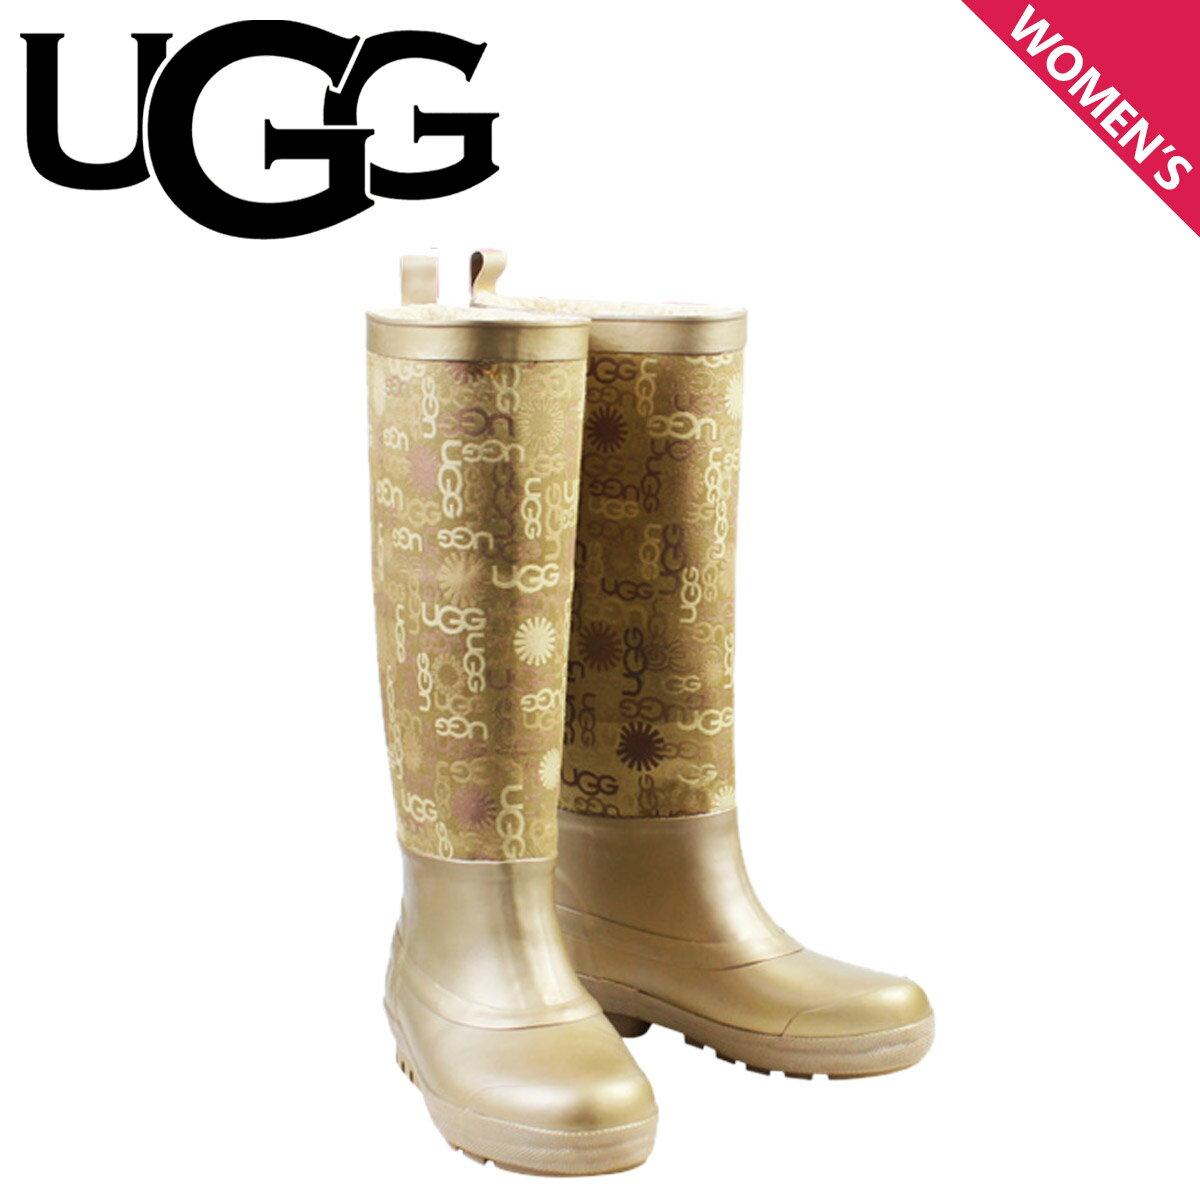 UGG アグ ブーツ レインブーツ ウォーリングフォード WOMENS WALLINGFORD 5700 ラバー レディース 【CLEARANCE】【返品不可】